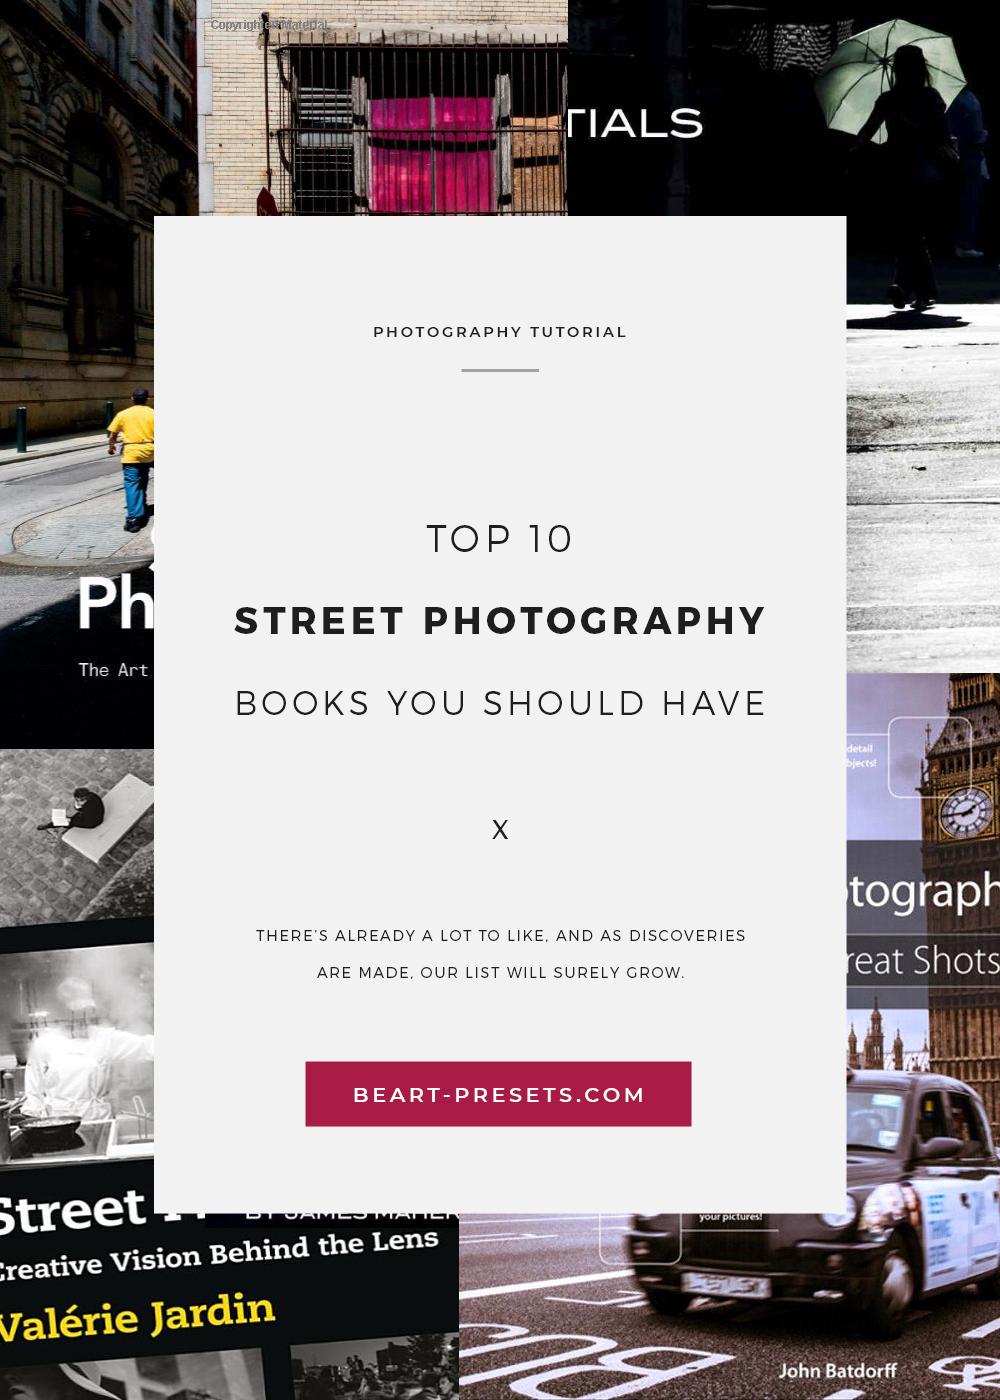 Street photography books